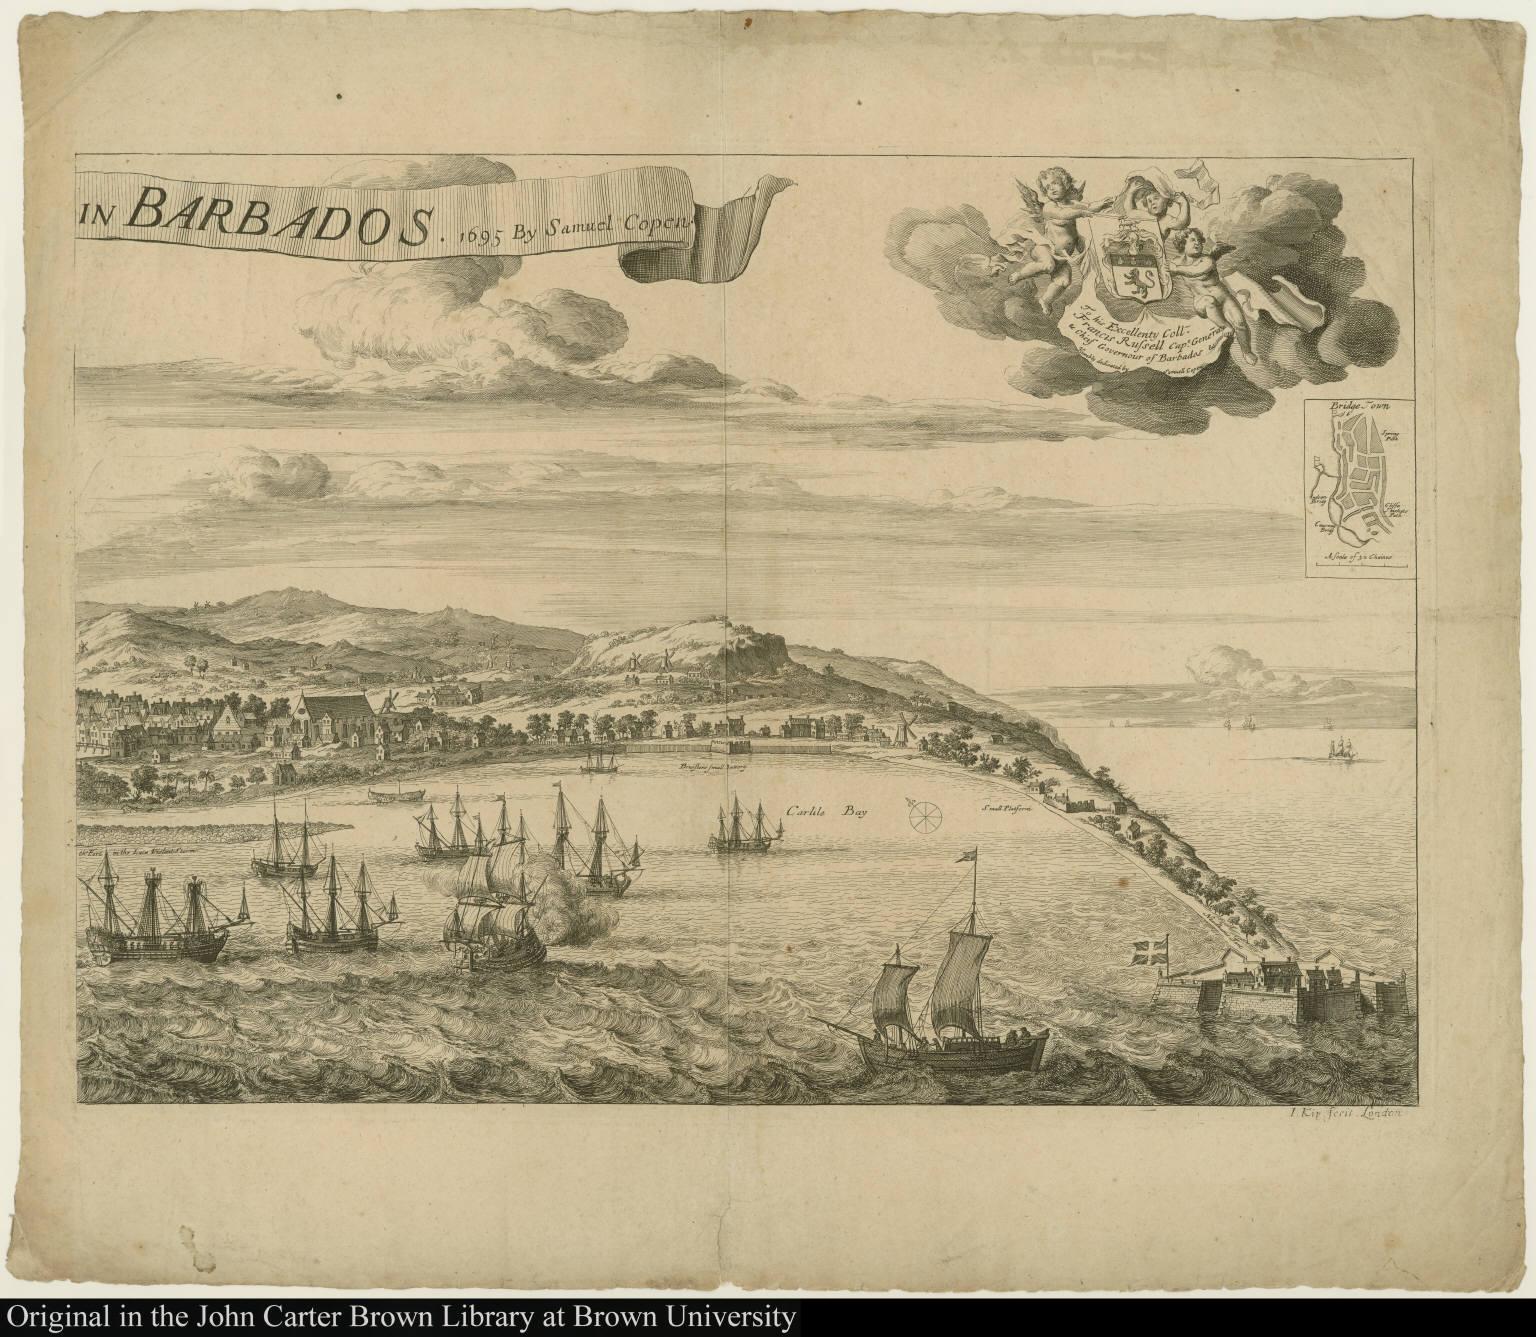 [A Prospect of Bridge Town] in Barbados. 1695 By Samuel Copen.